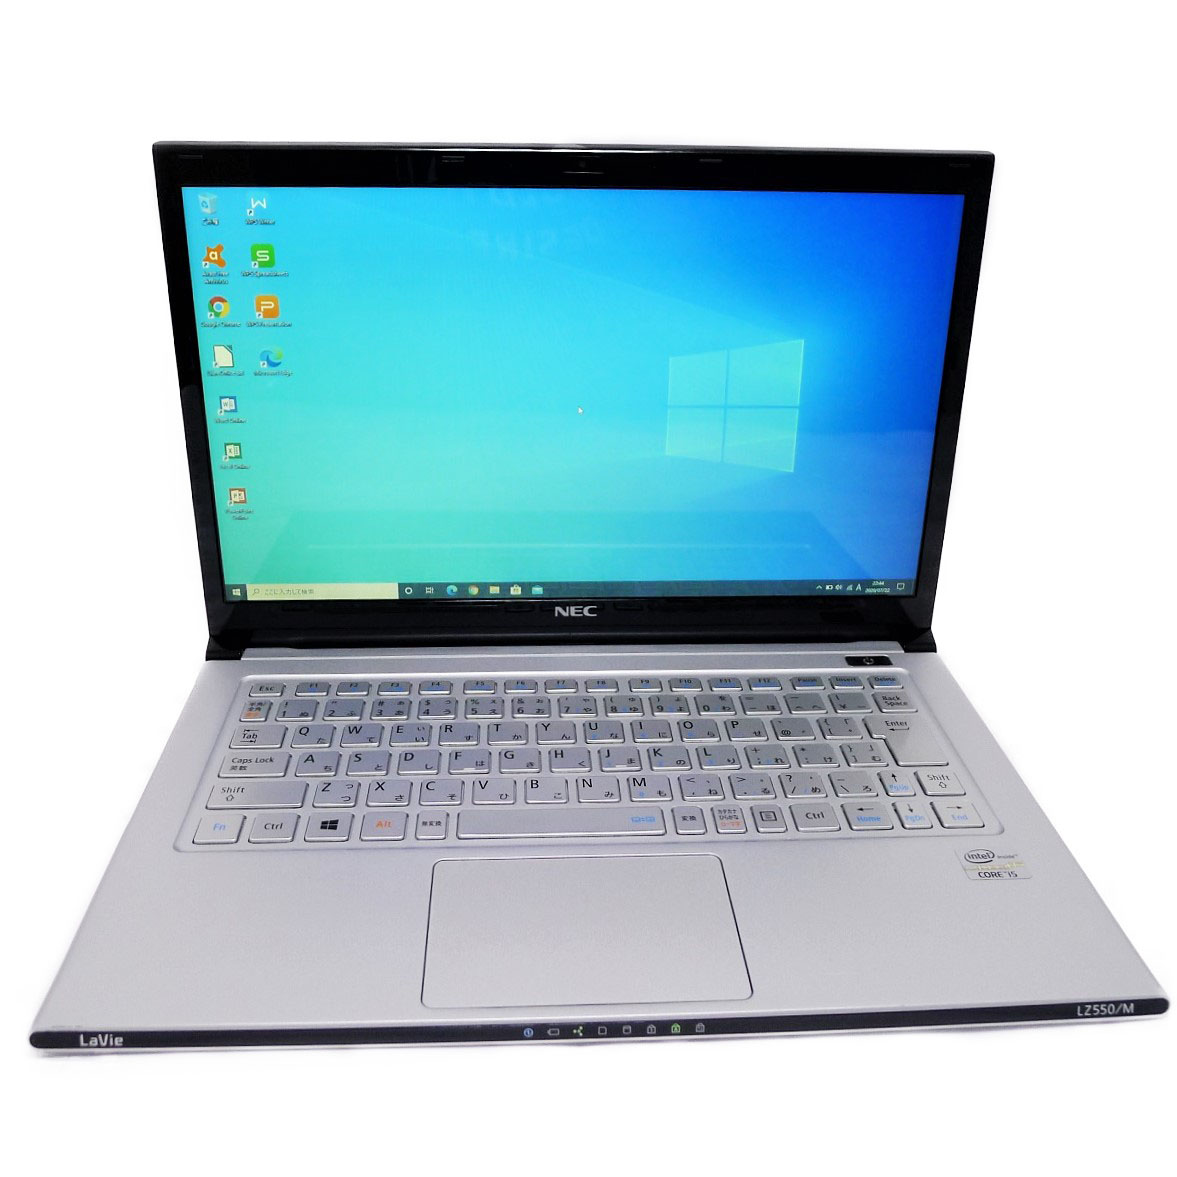 NEC LaVie LZ550MSSCore i5 4GB 新品SSD960GB 無線LAN Windows10 64bitWPSOffice 13.3インチ モバイルノート 中古 中古パソコン 【中古】 ノートパソコン